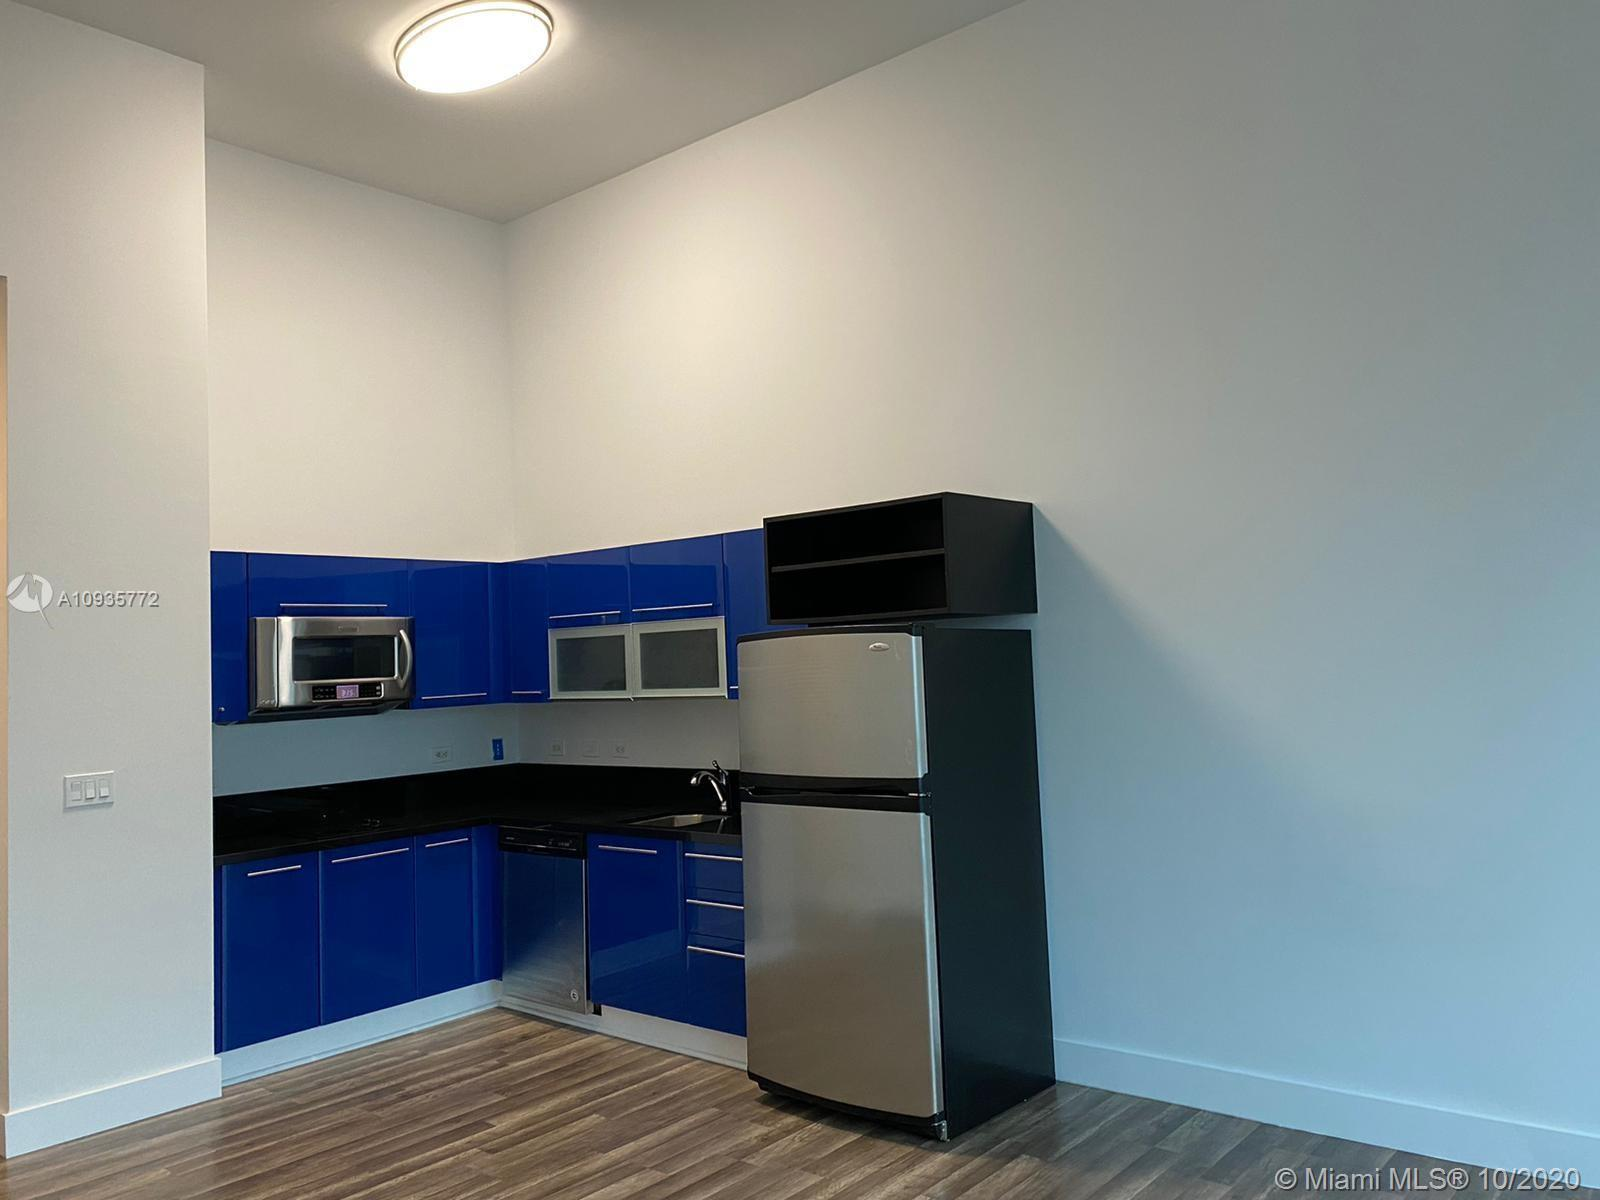 Really nice studio apartment in the heart of Miami! Freshly-painted walls, vinyl wood floors, modern